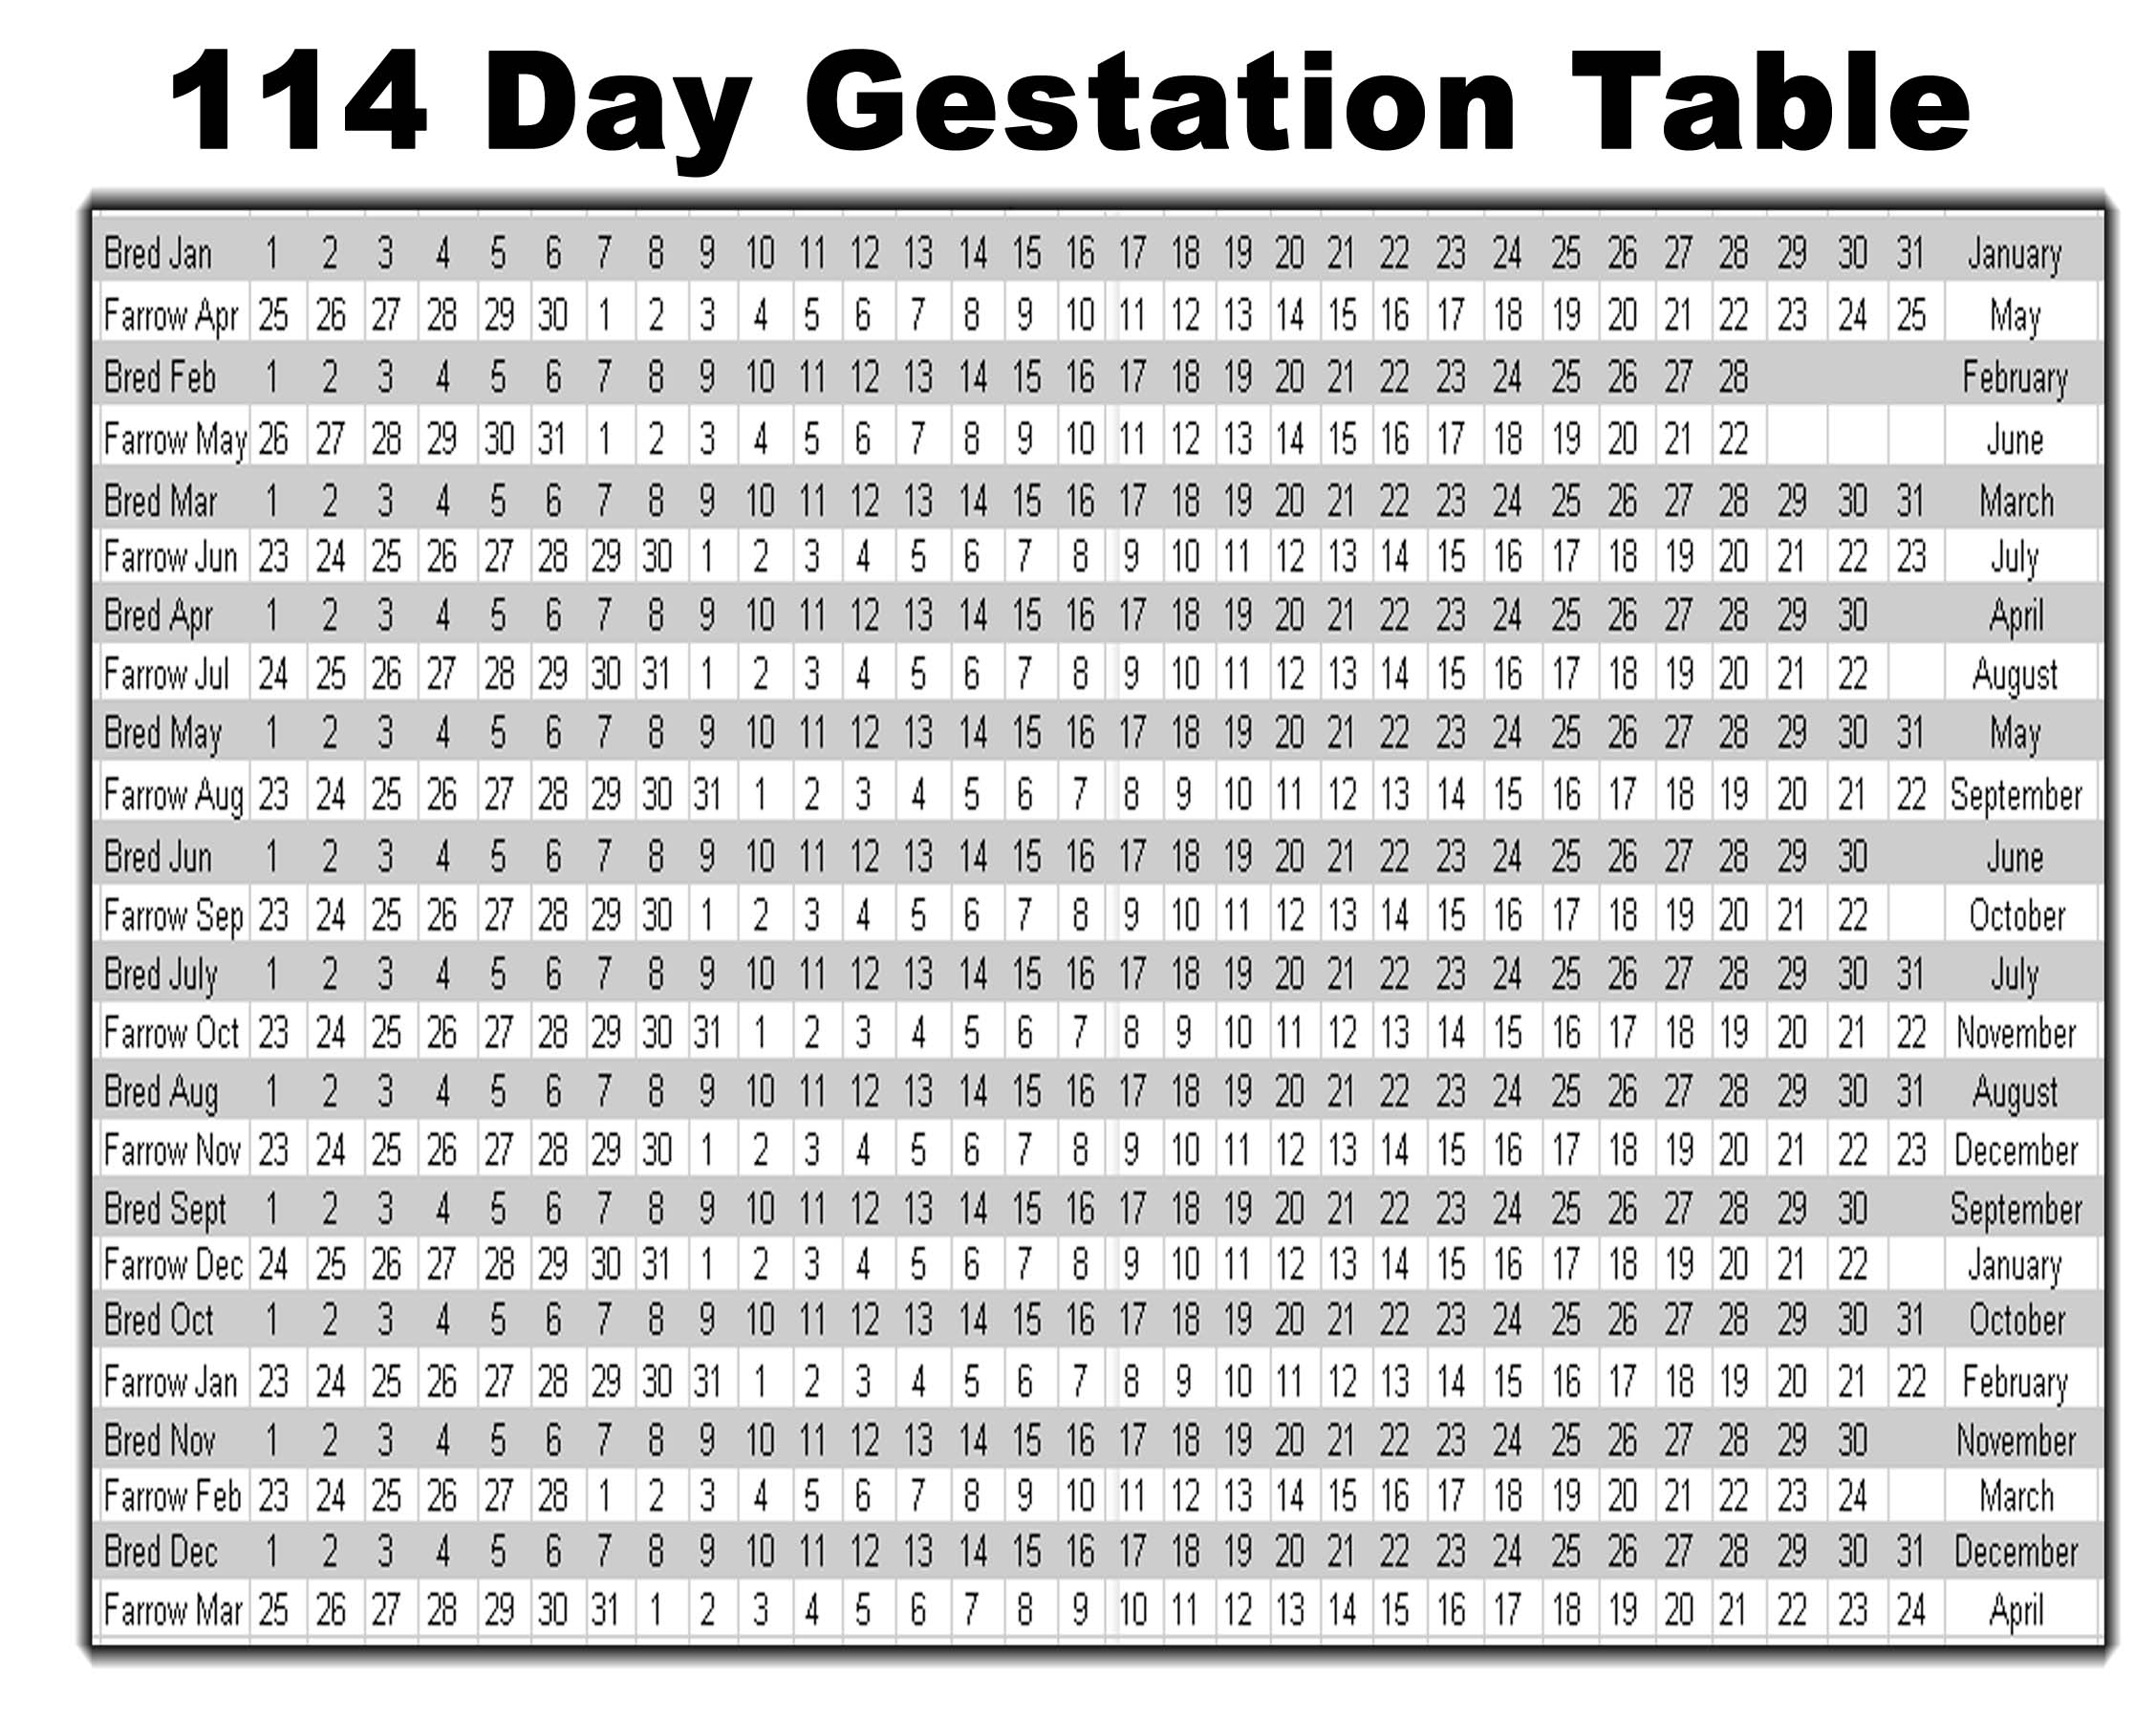 Swine Pig Gestation Table